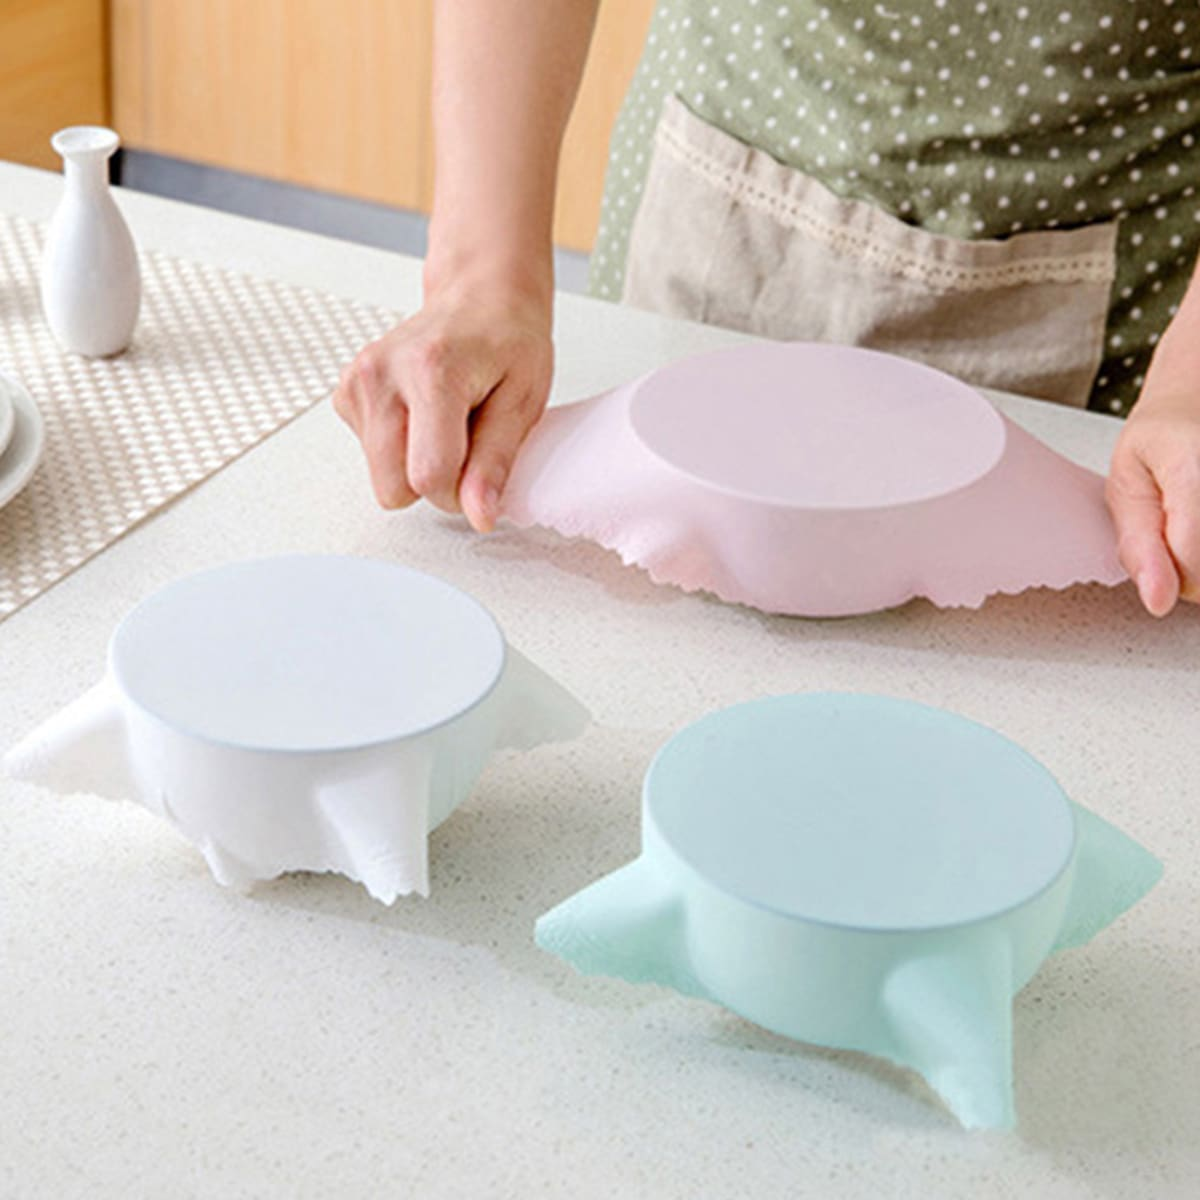 SHEIN / 1pc Silicone Sealed Bowl Wrap